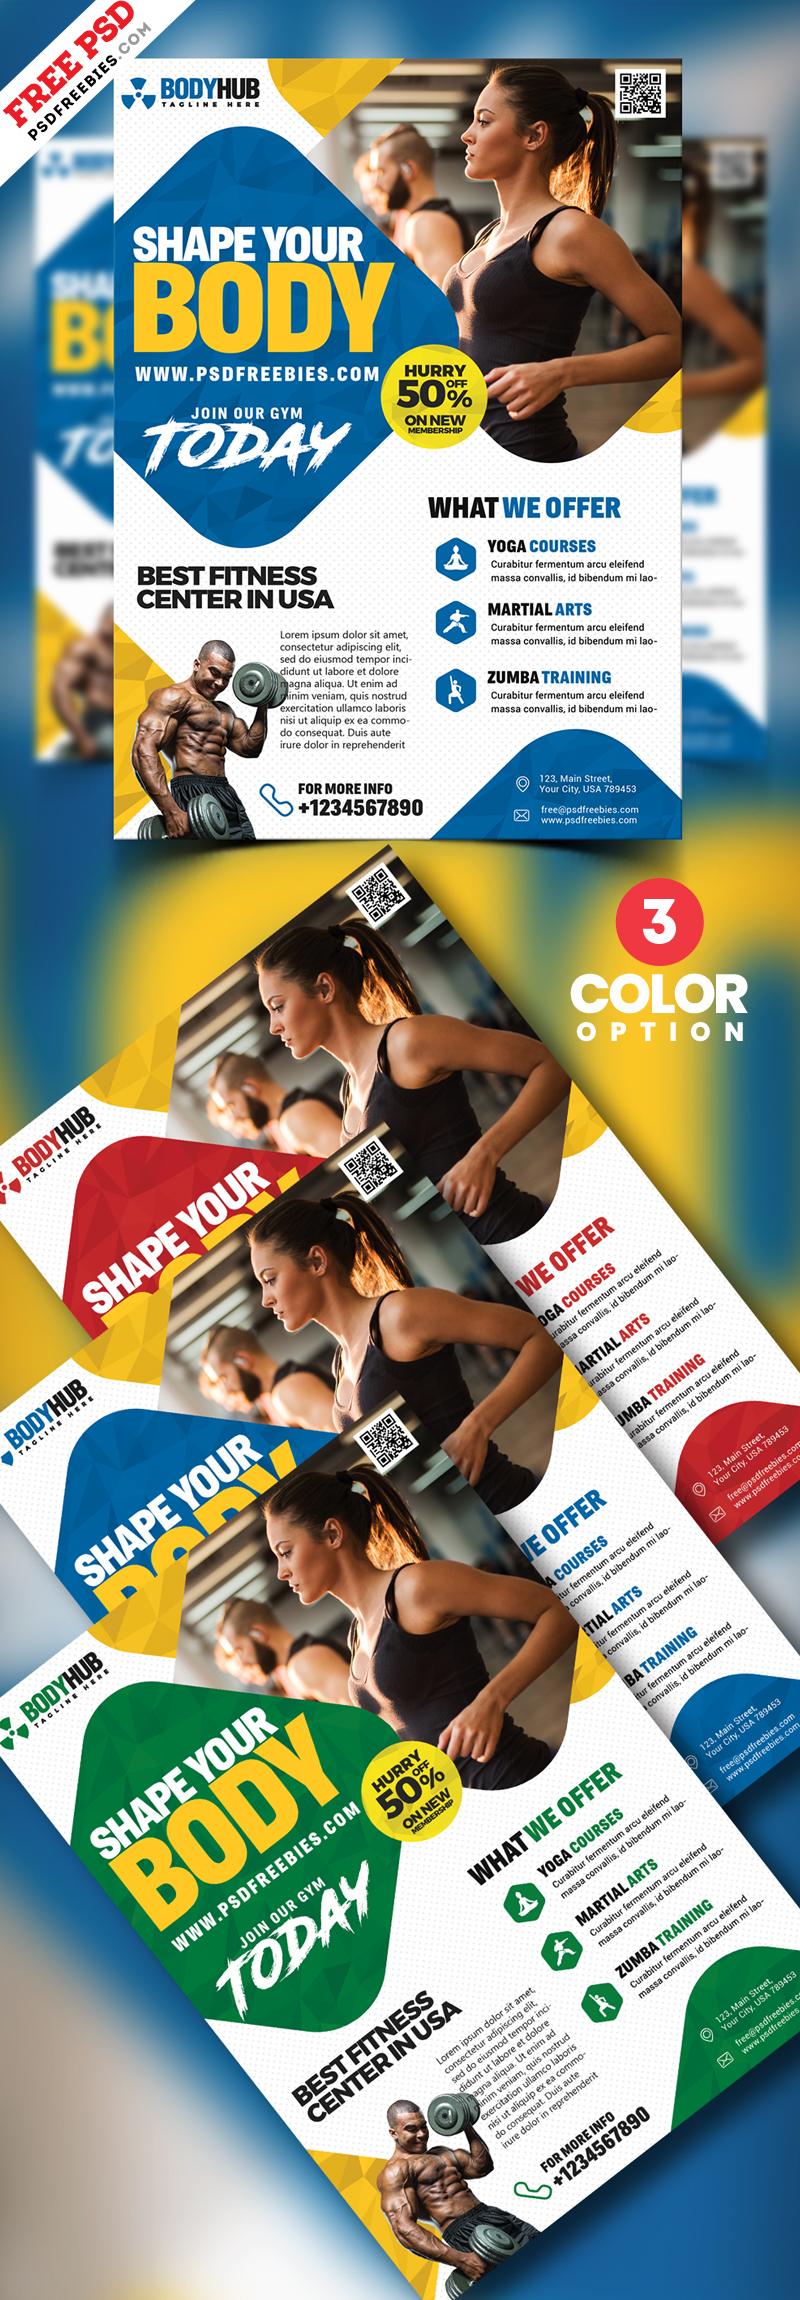 Fitness Body Studio Flyer Designs PSD